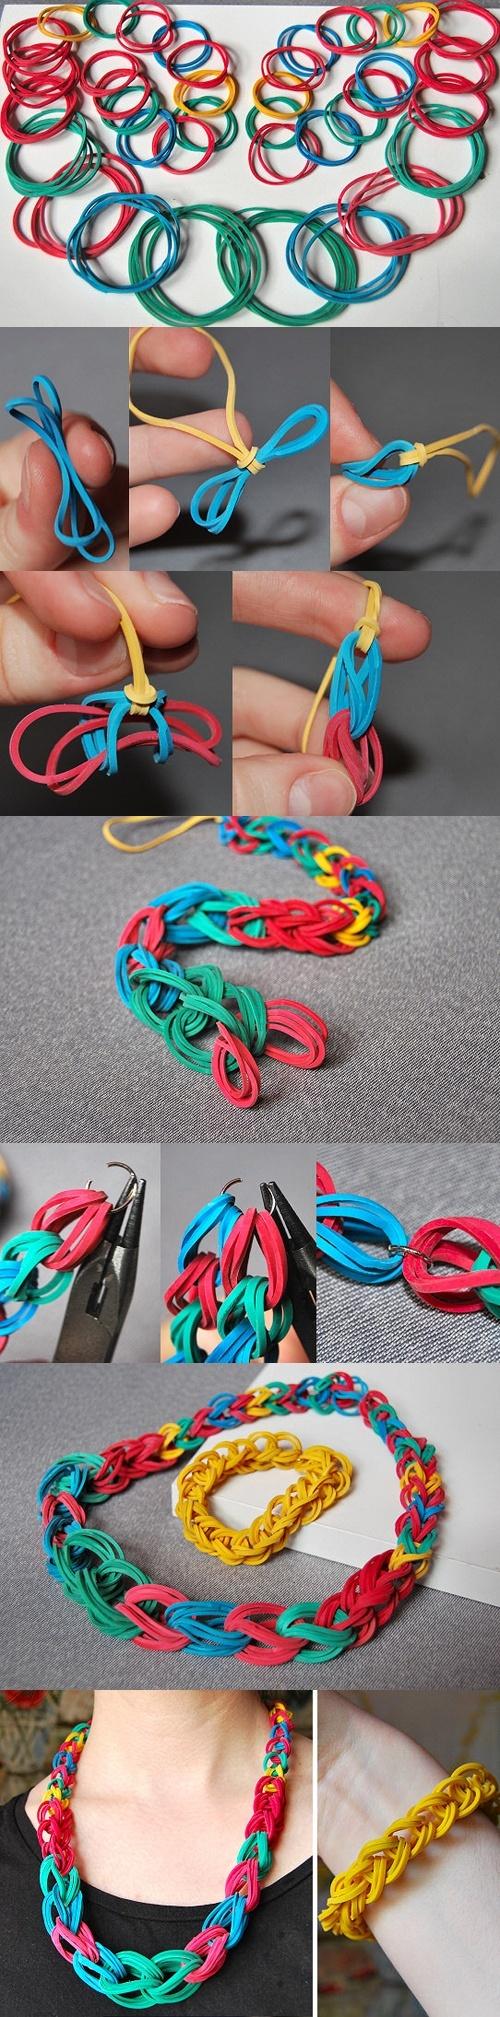 DIY-Simple-Rubber-Band-Bracelet